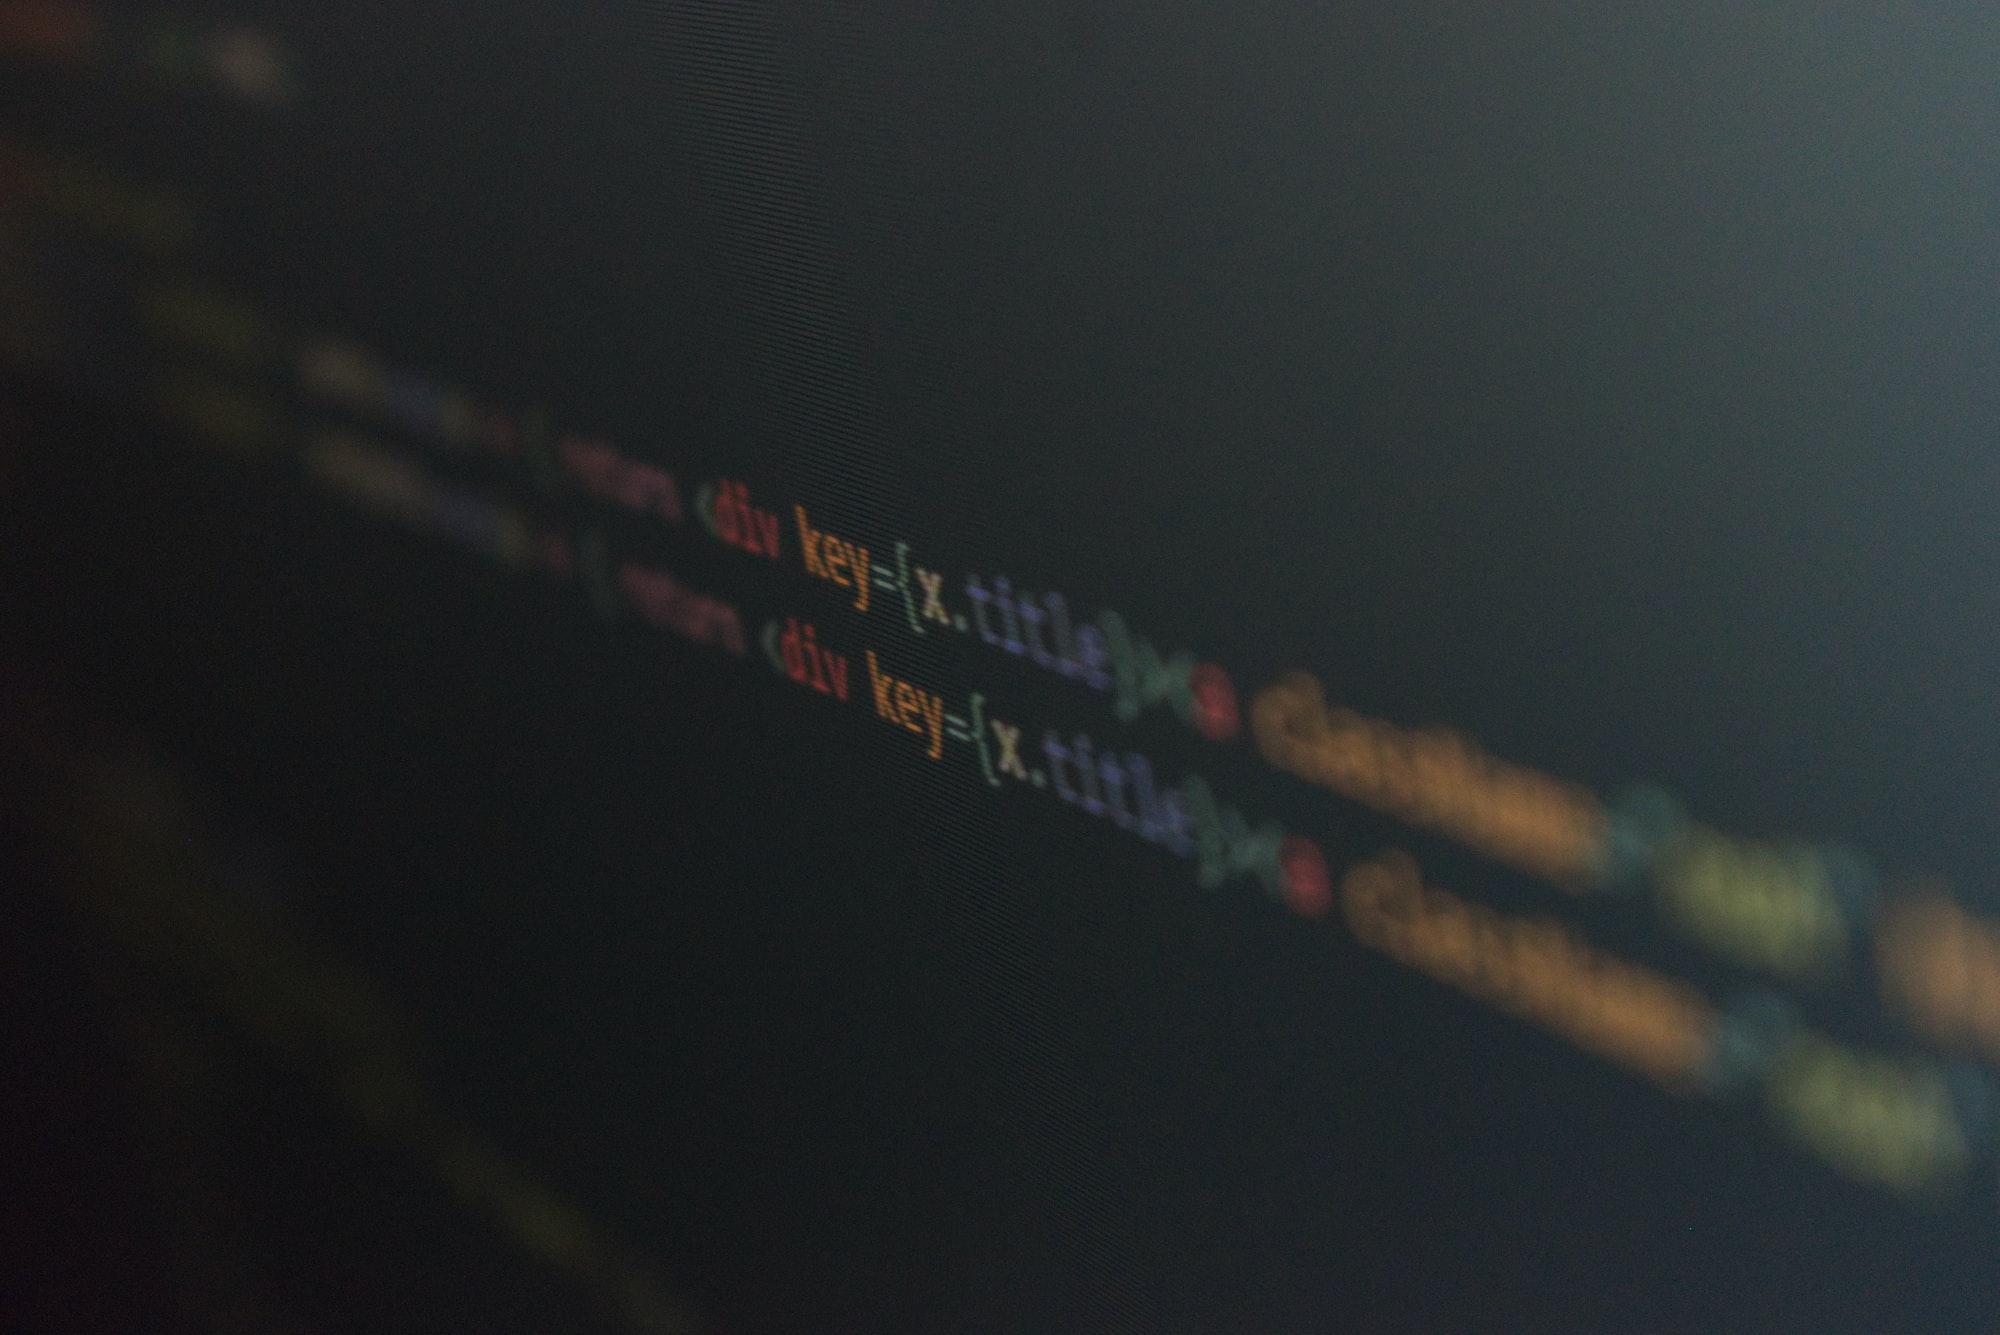 Programming Tip #4 - Code Review